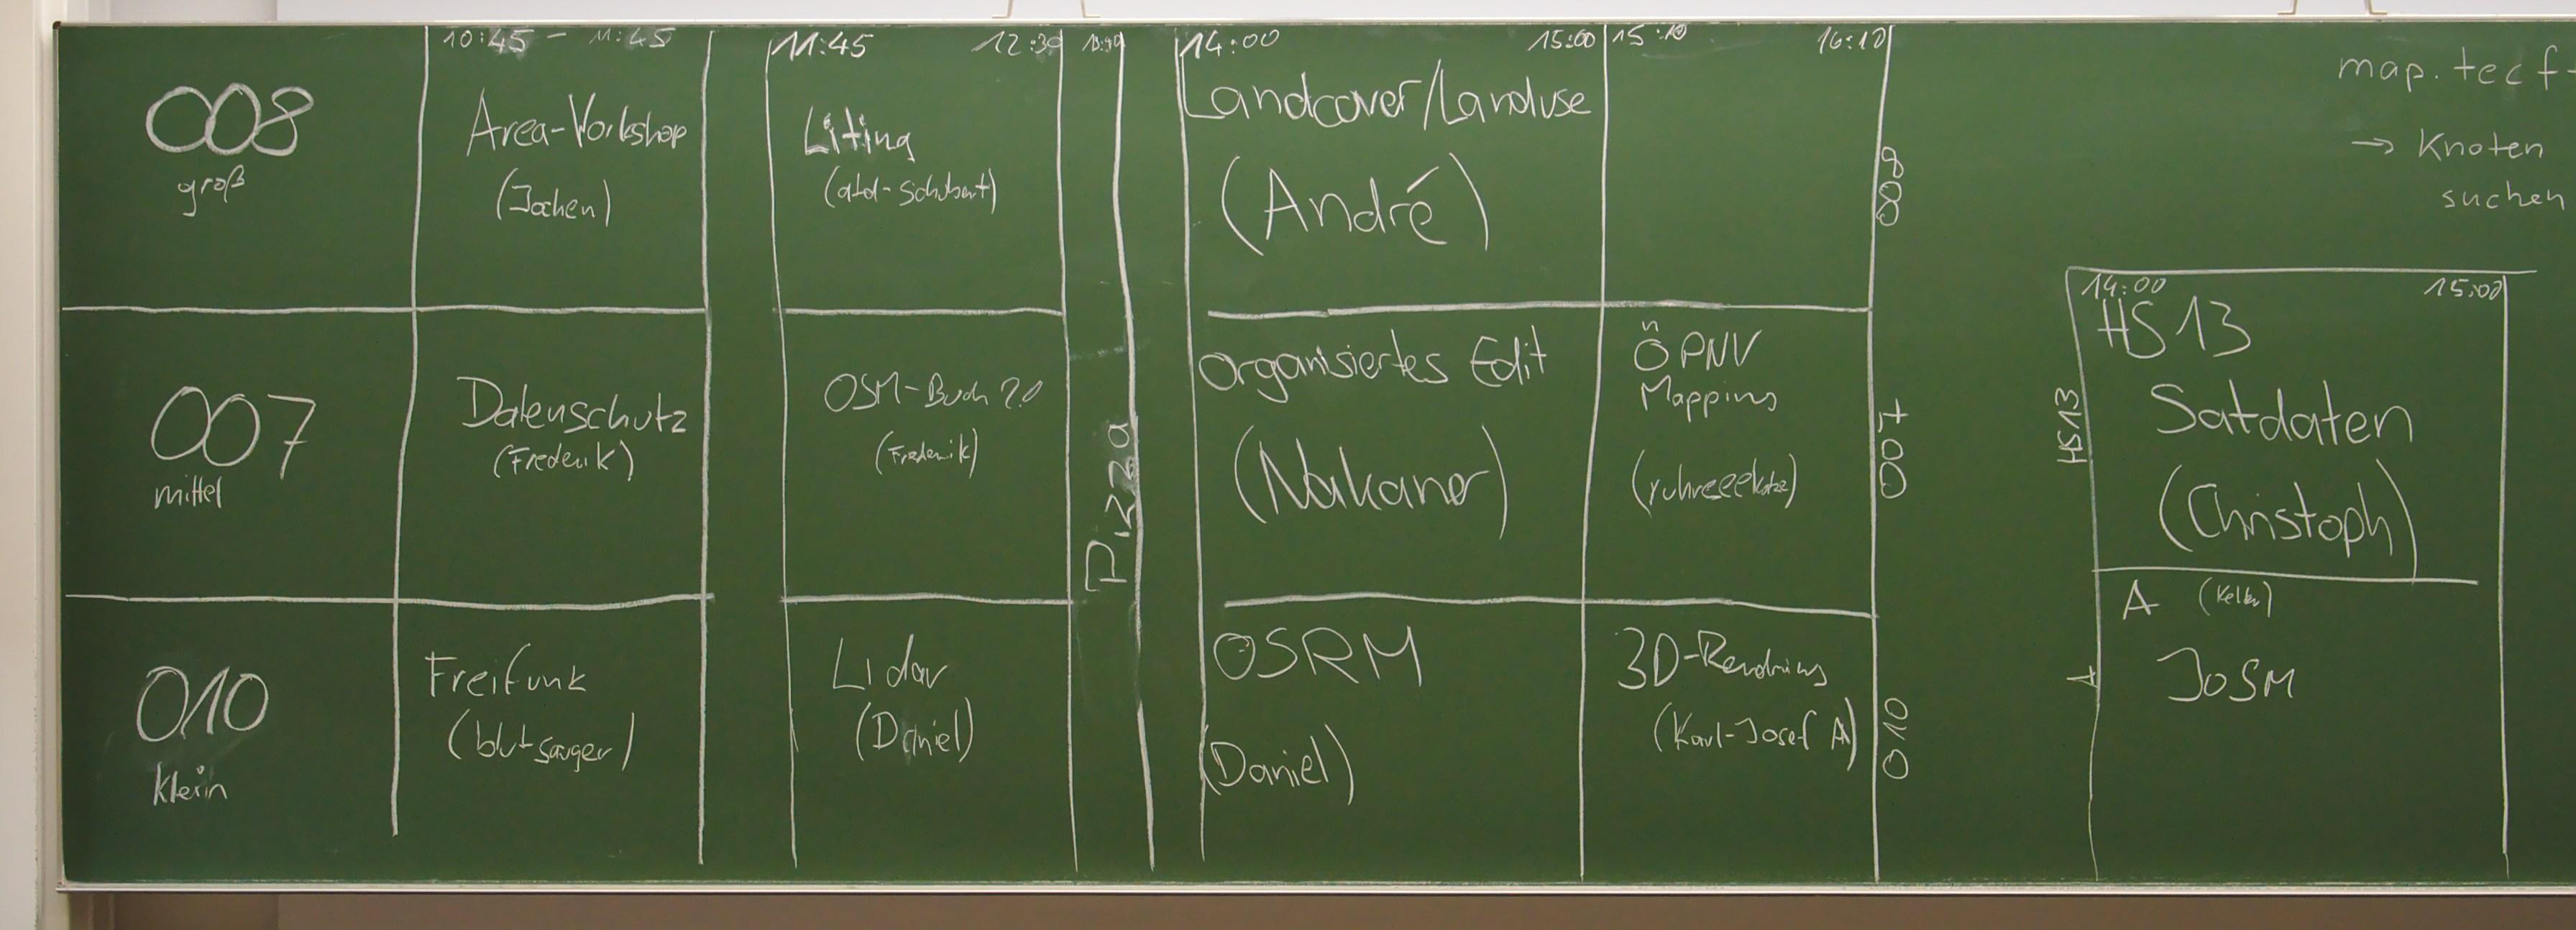 Tafel mit Zeitplanung des OSM-Samstags